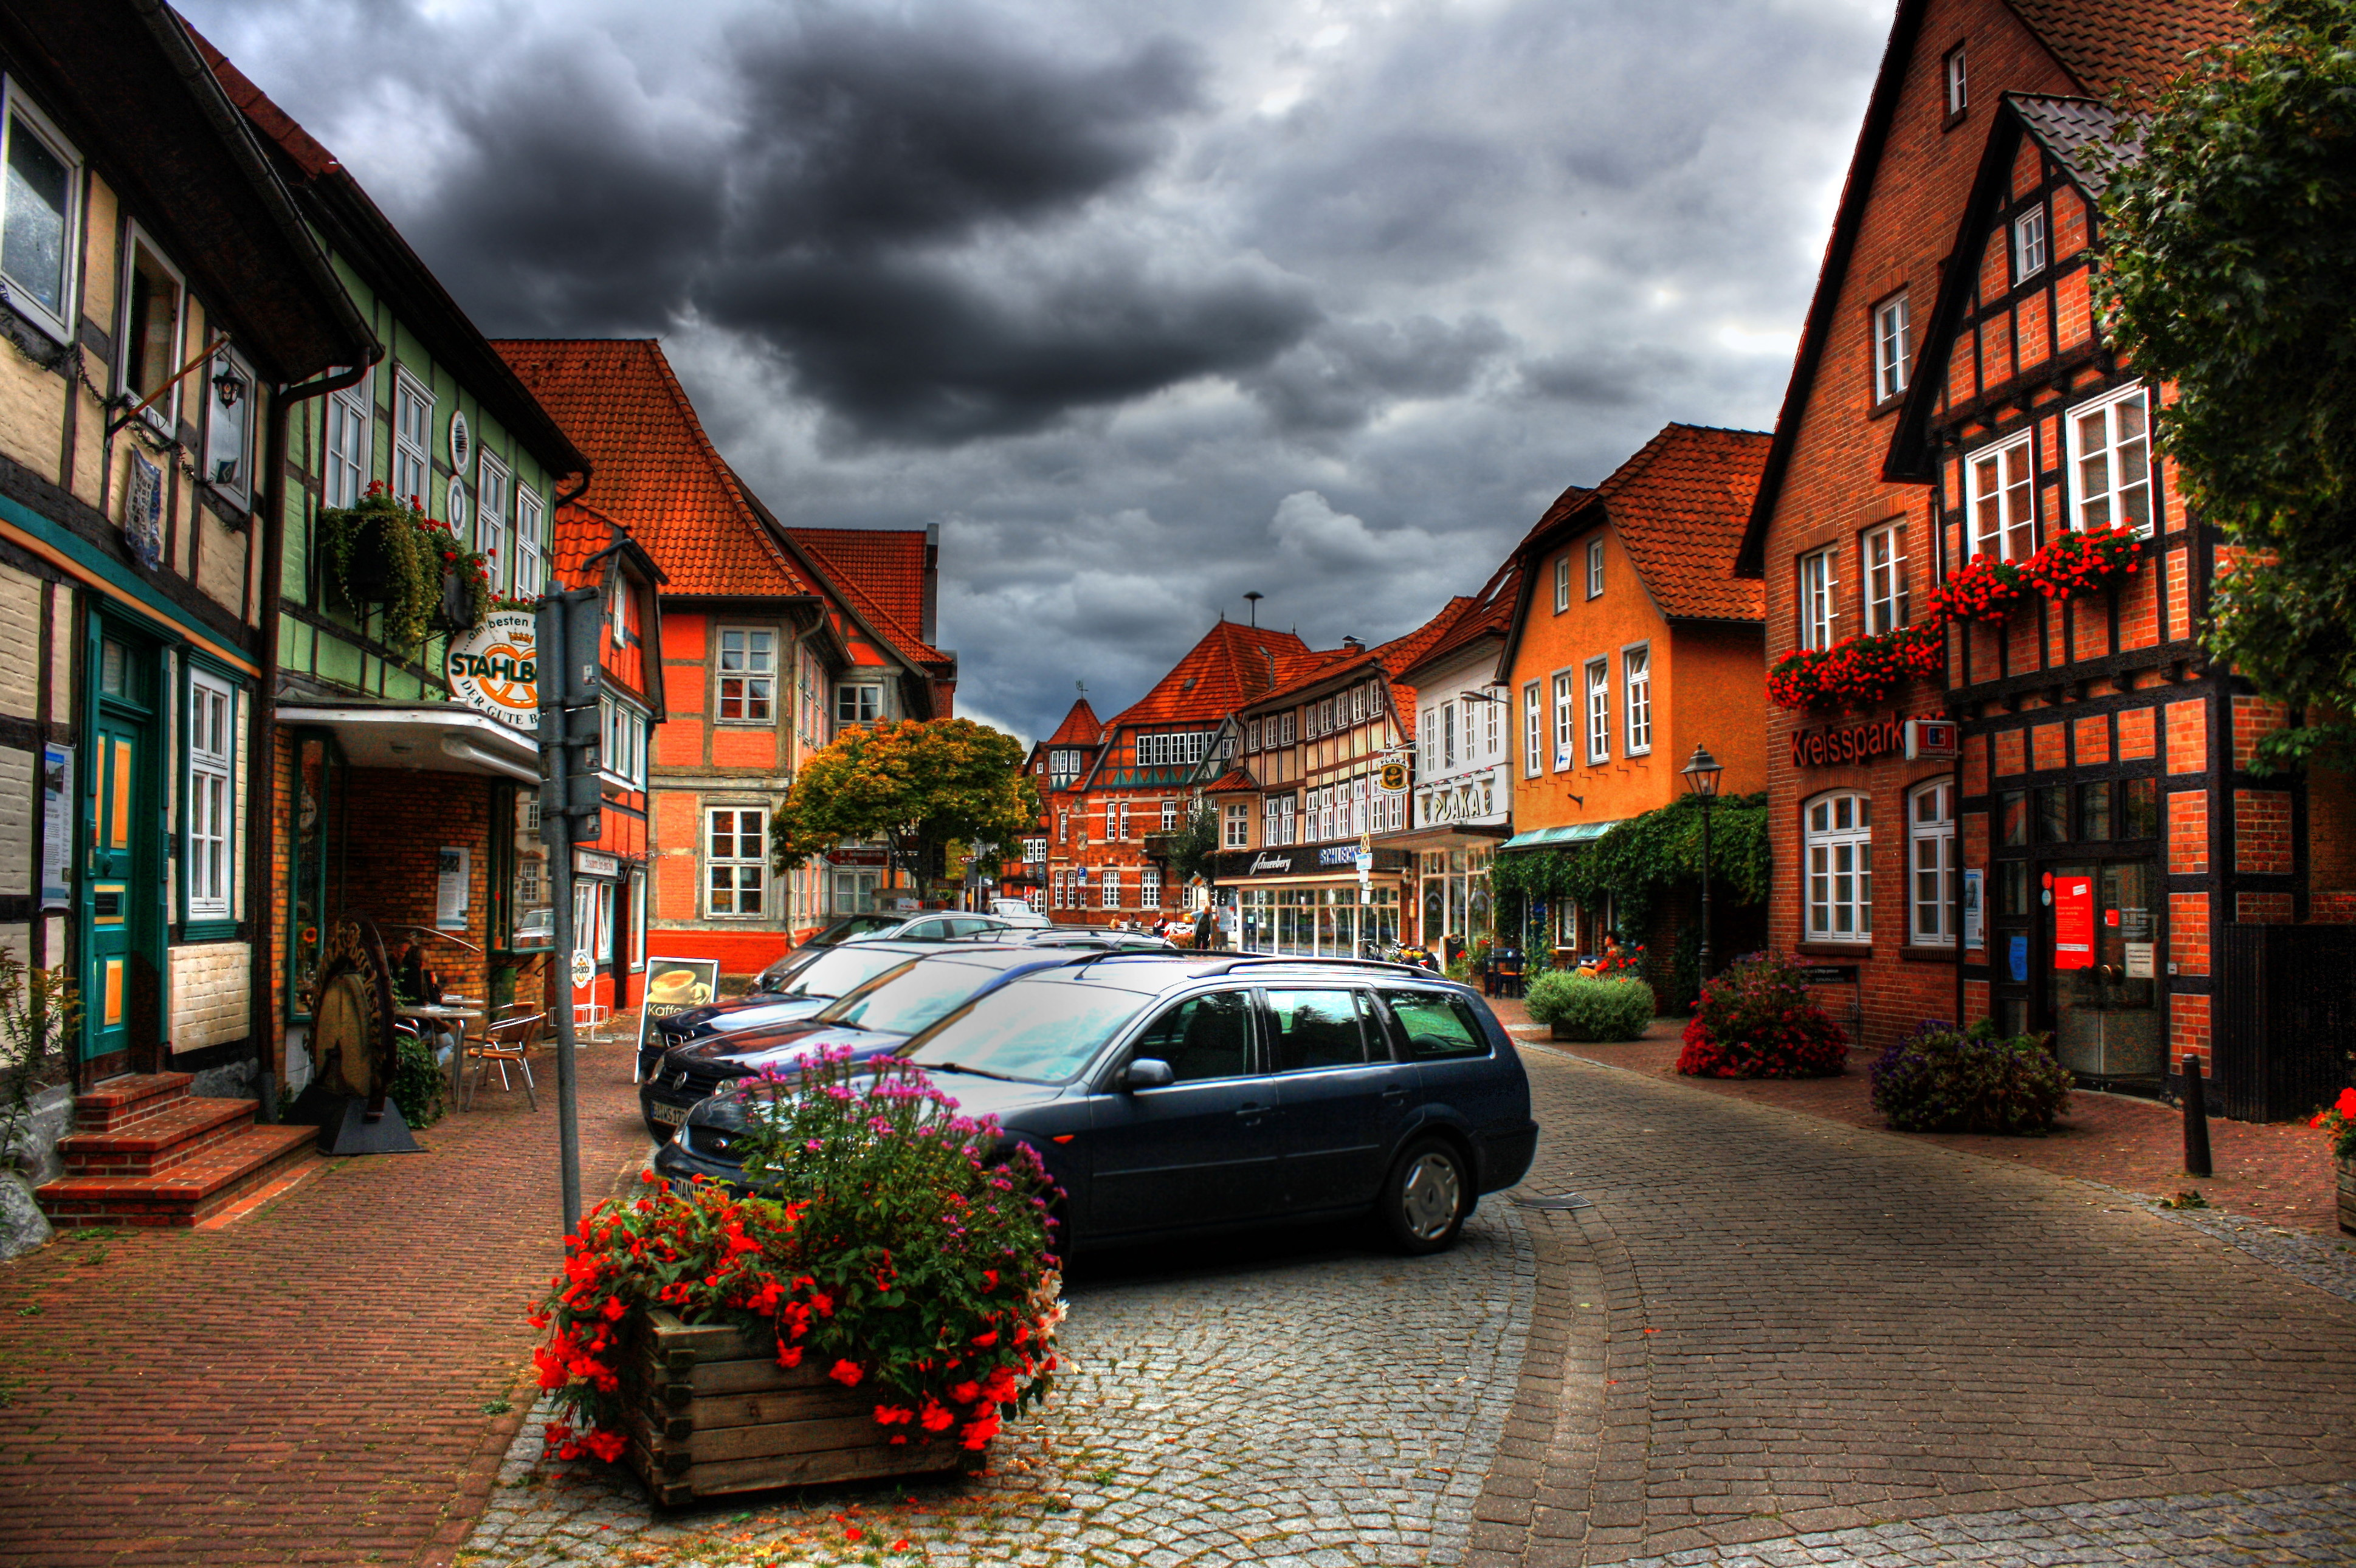 Lorch Village, Hesse, Rhine River, Germany  № 78337  скачать